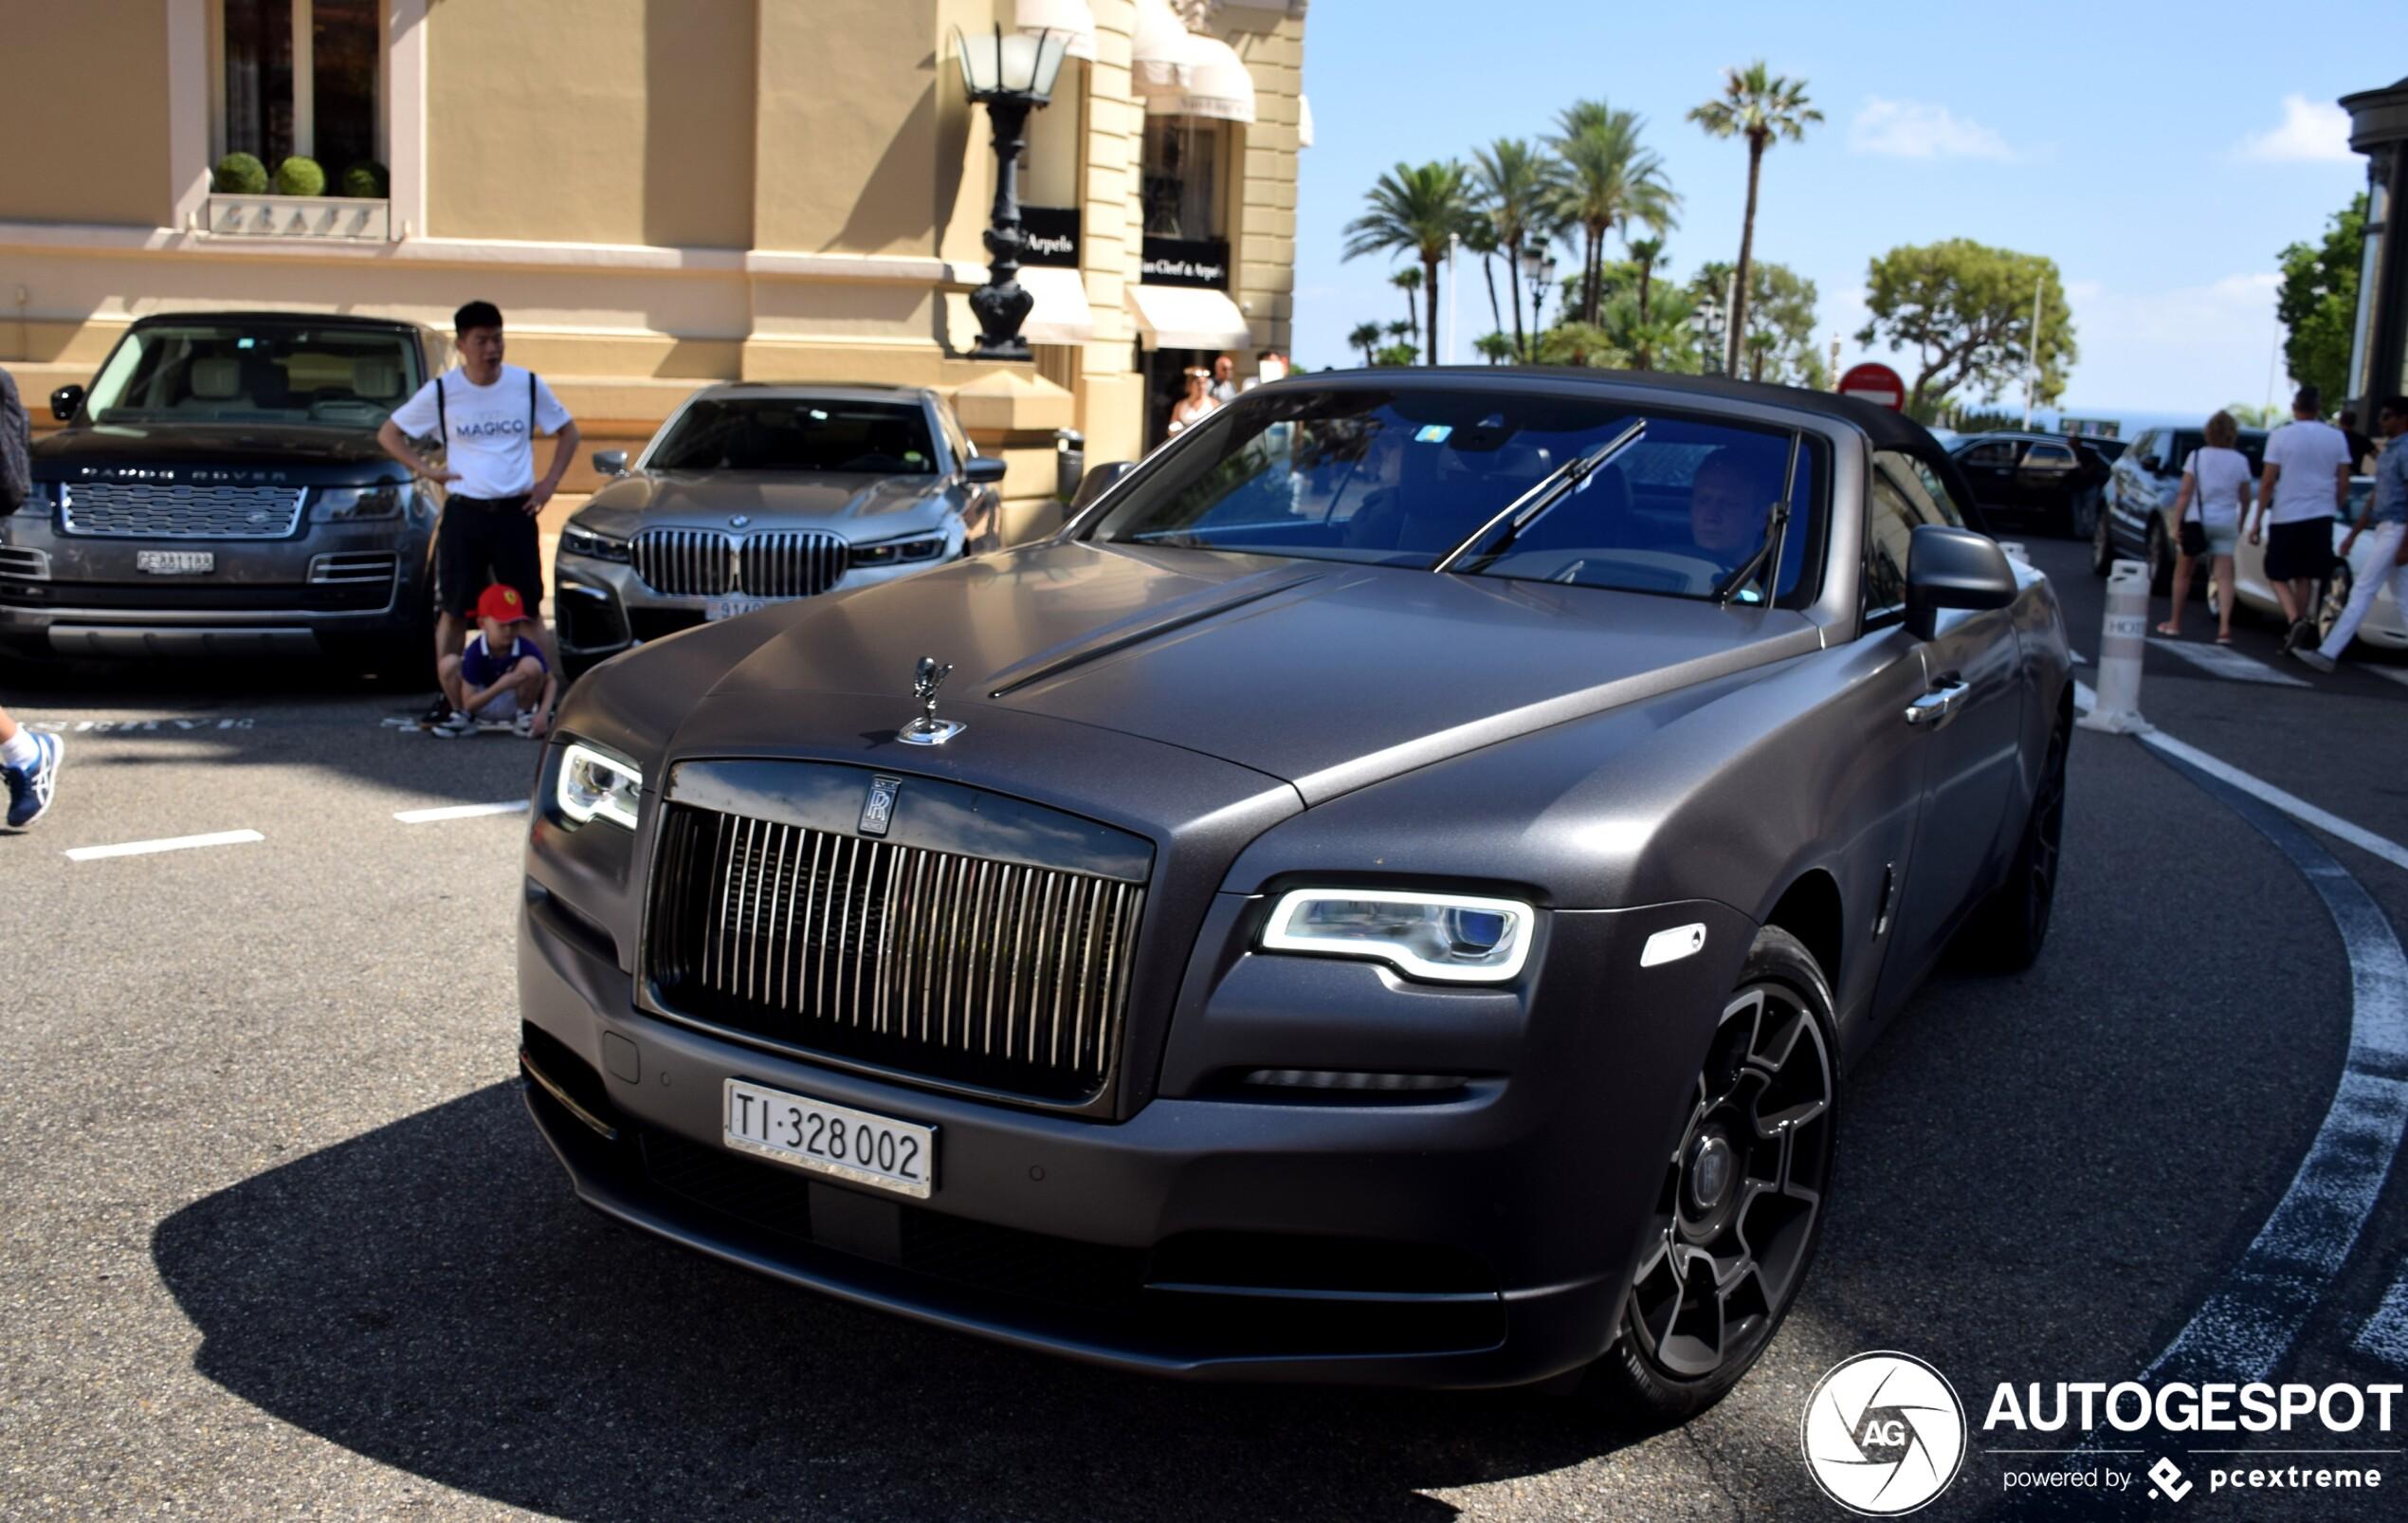 The best-looking Rolls Royce's of the week.